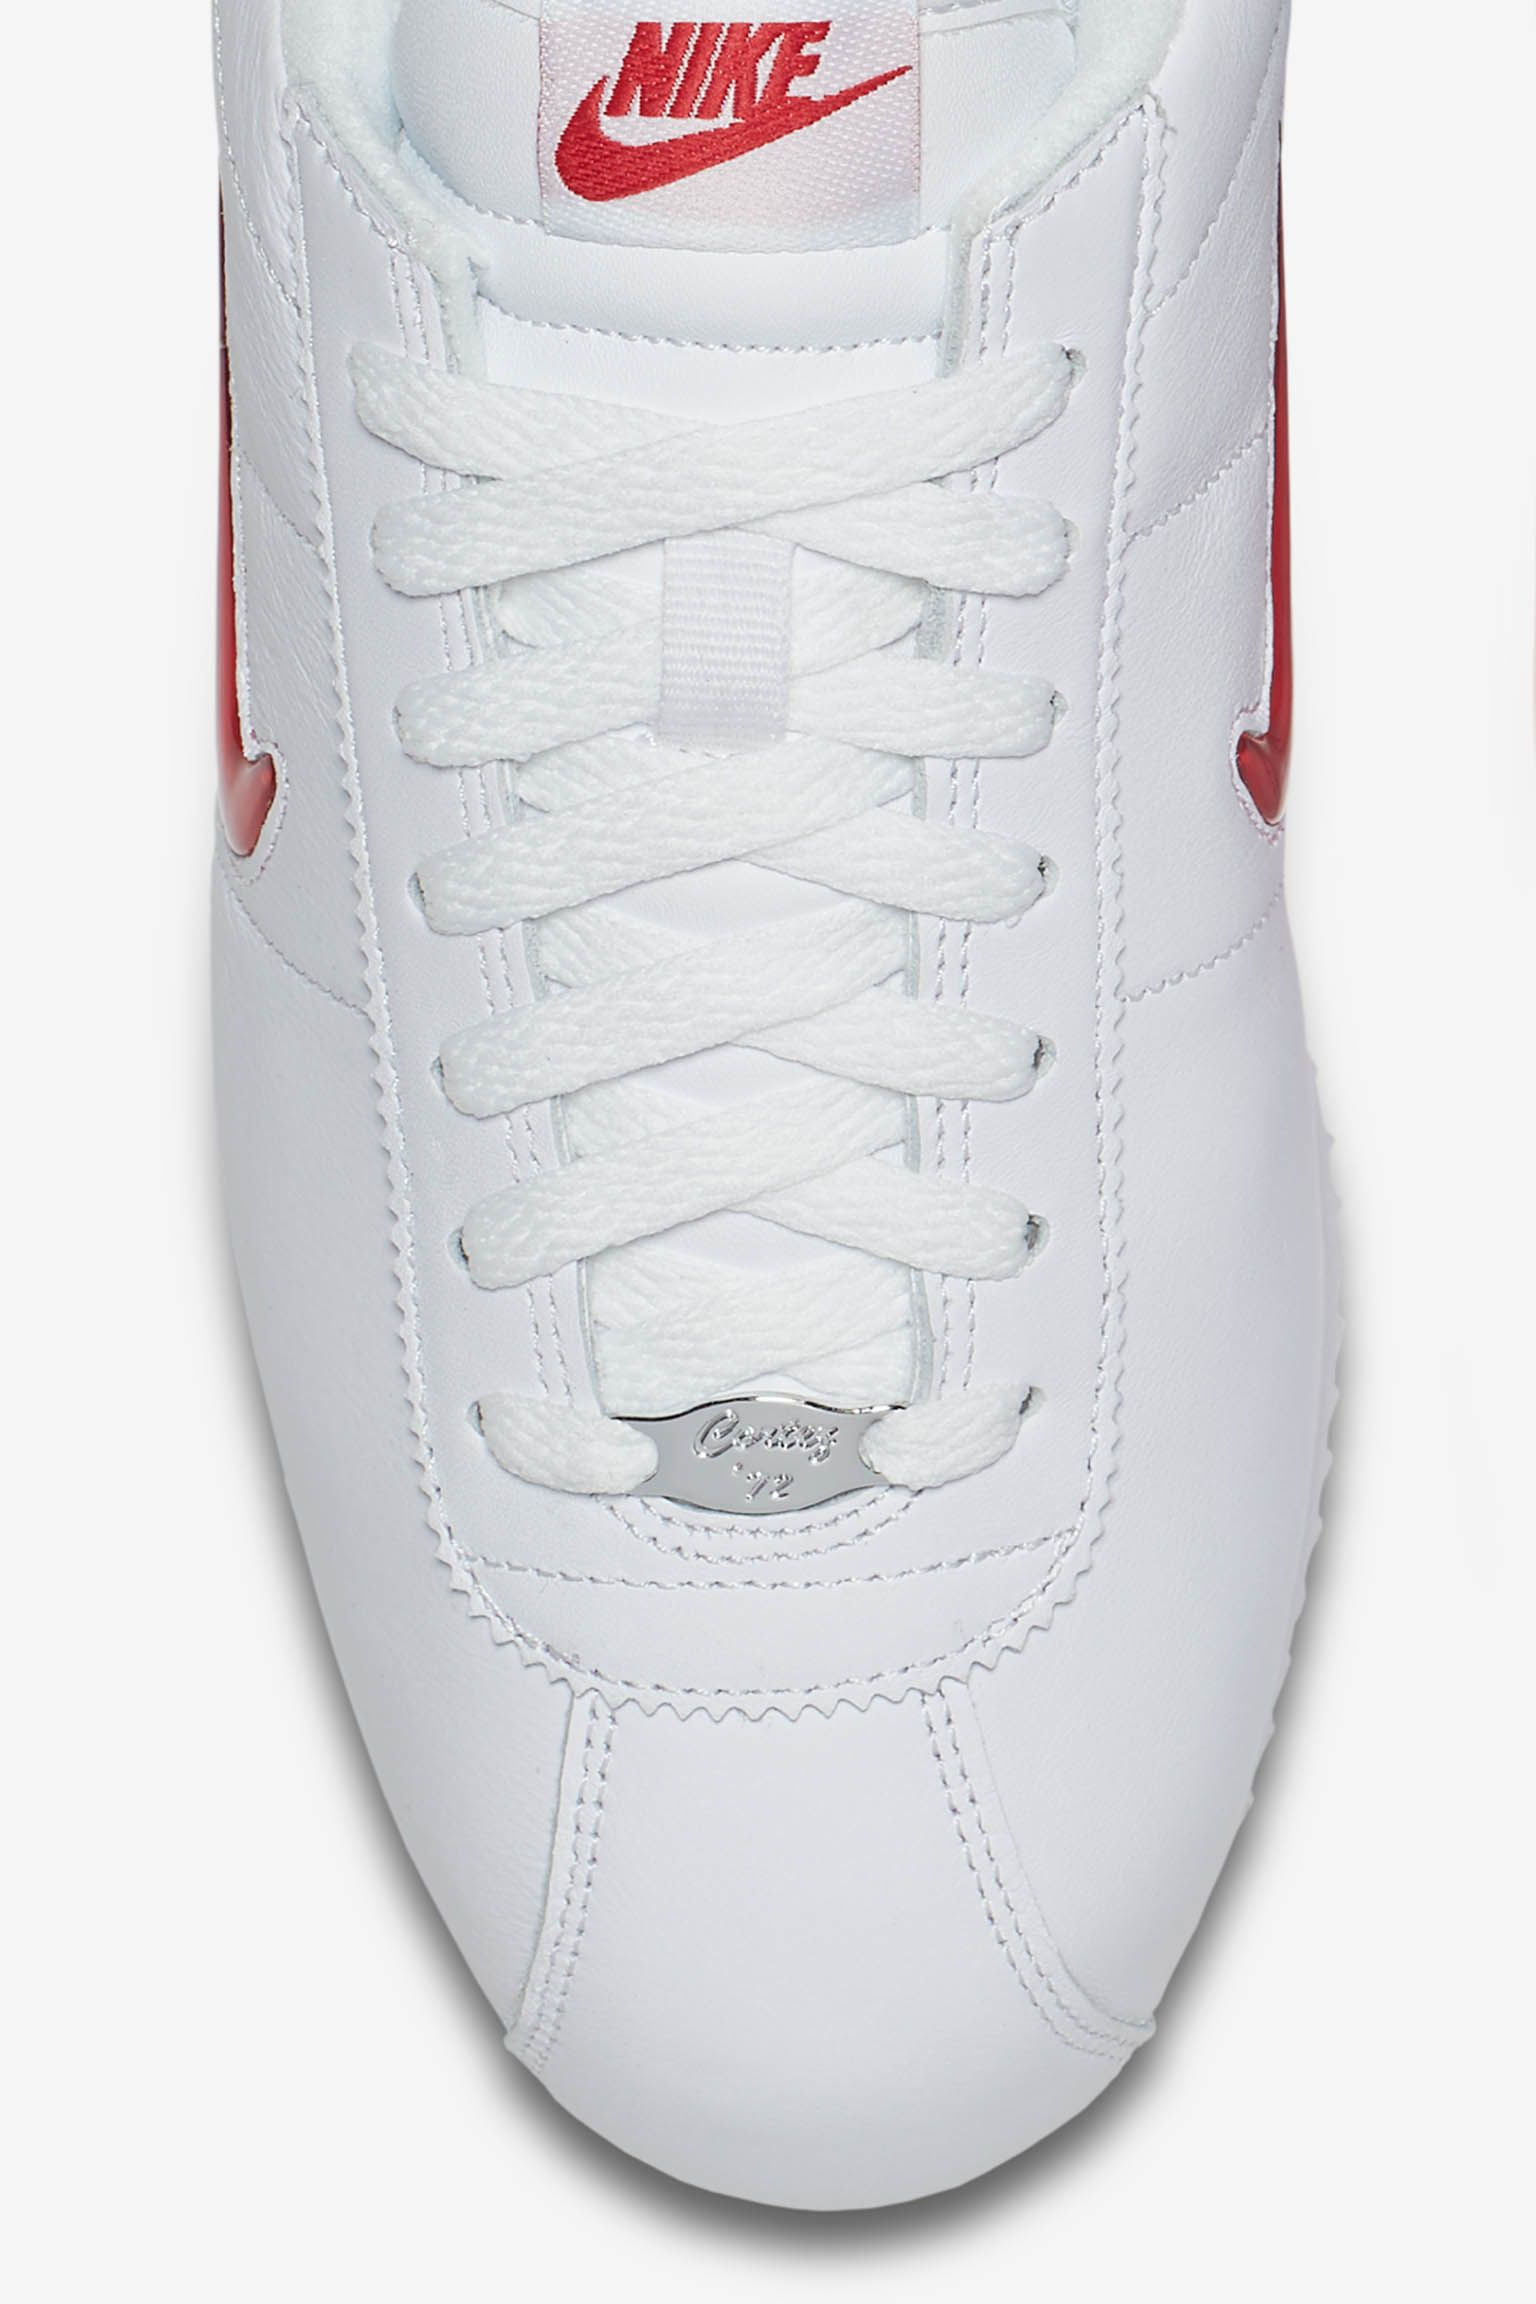 Nike Cortez Jewel 'White & University Red' Release Date